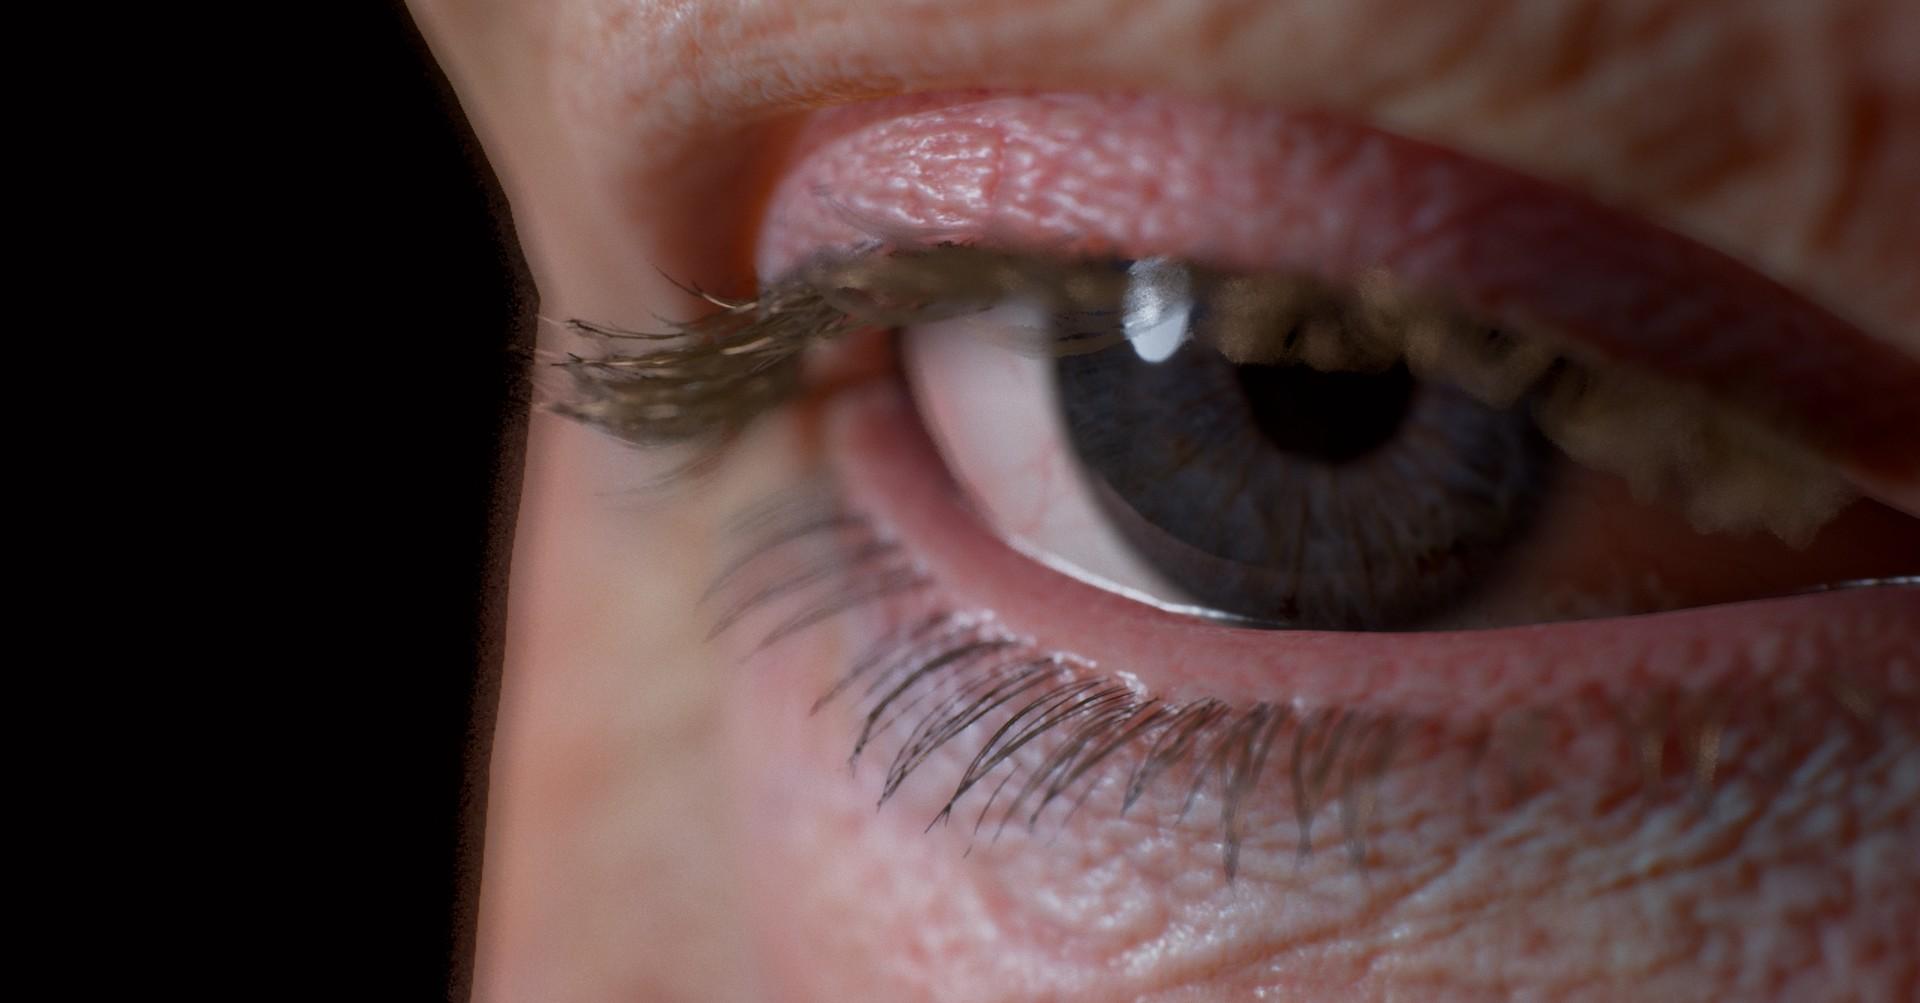 Vimal kerketta eye 3